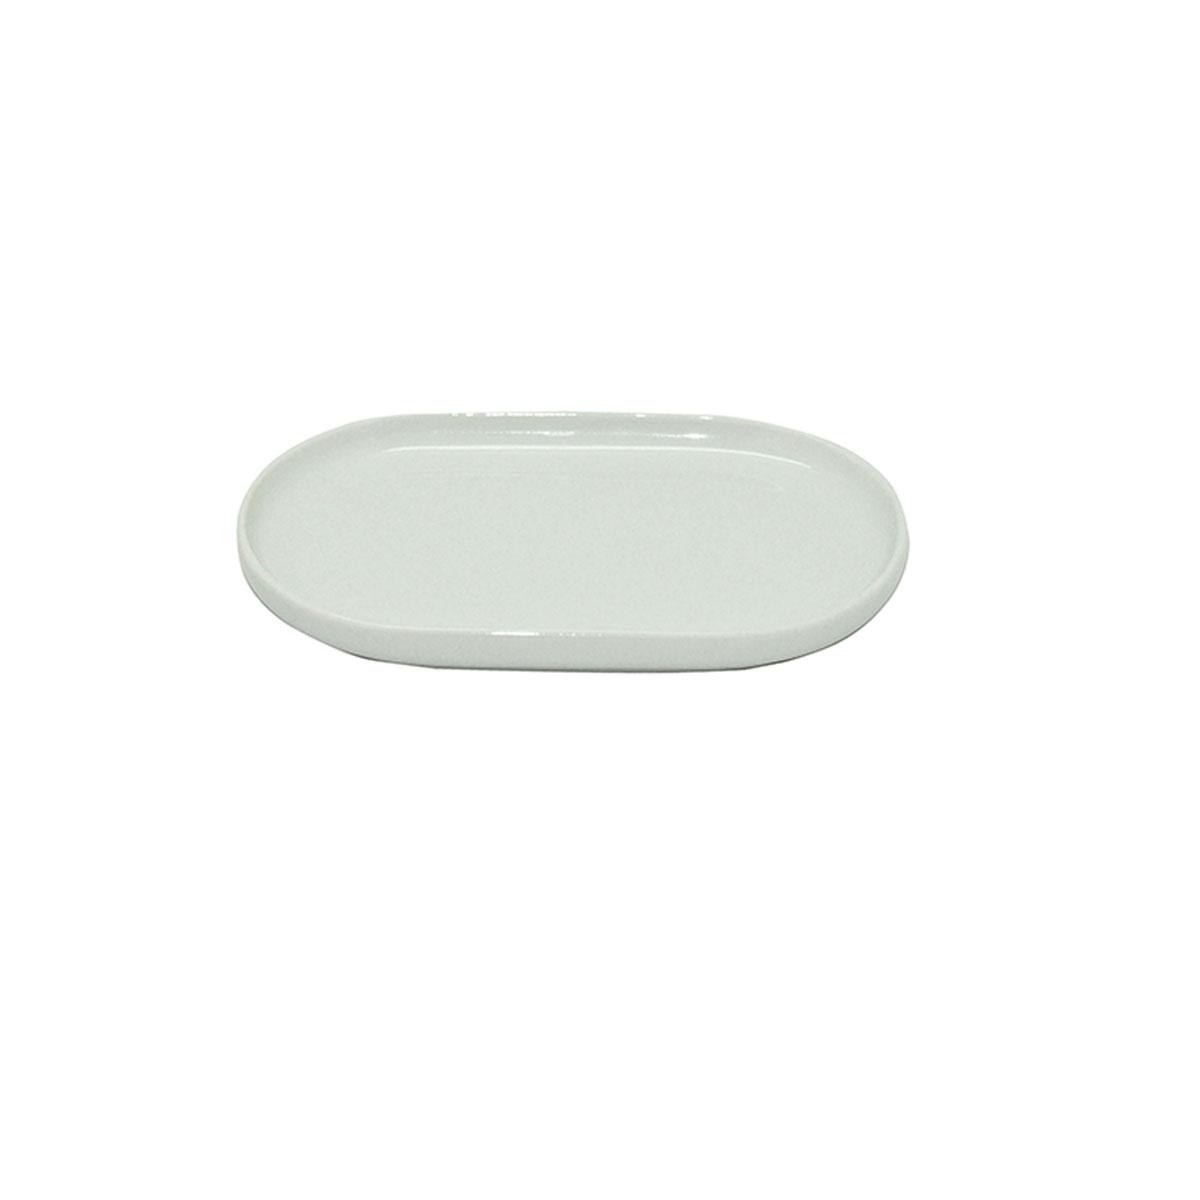 Porte savon en porcelaine (Blanc)